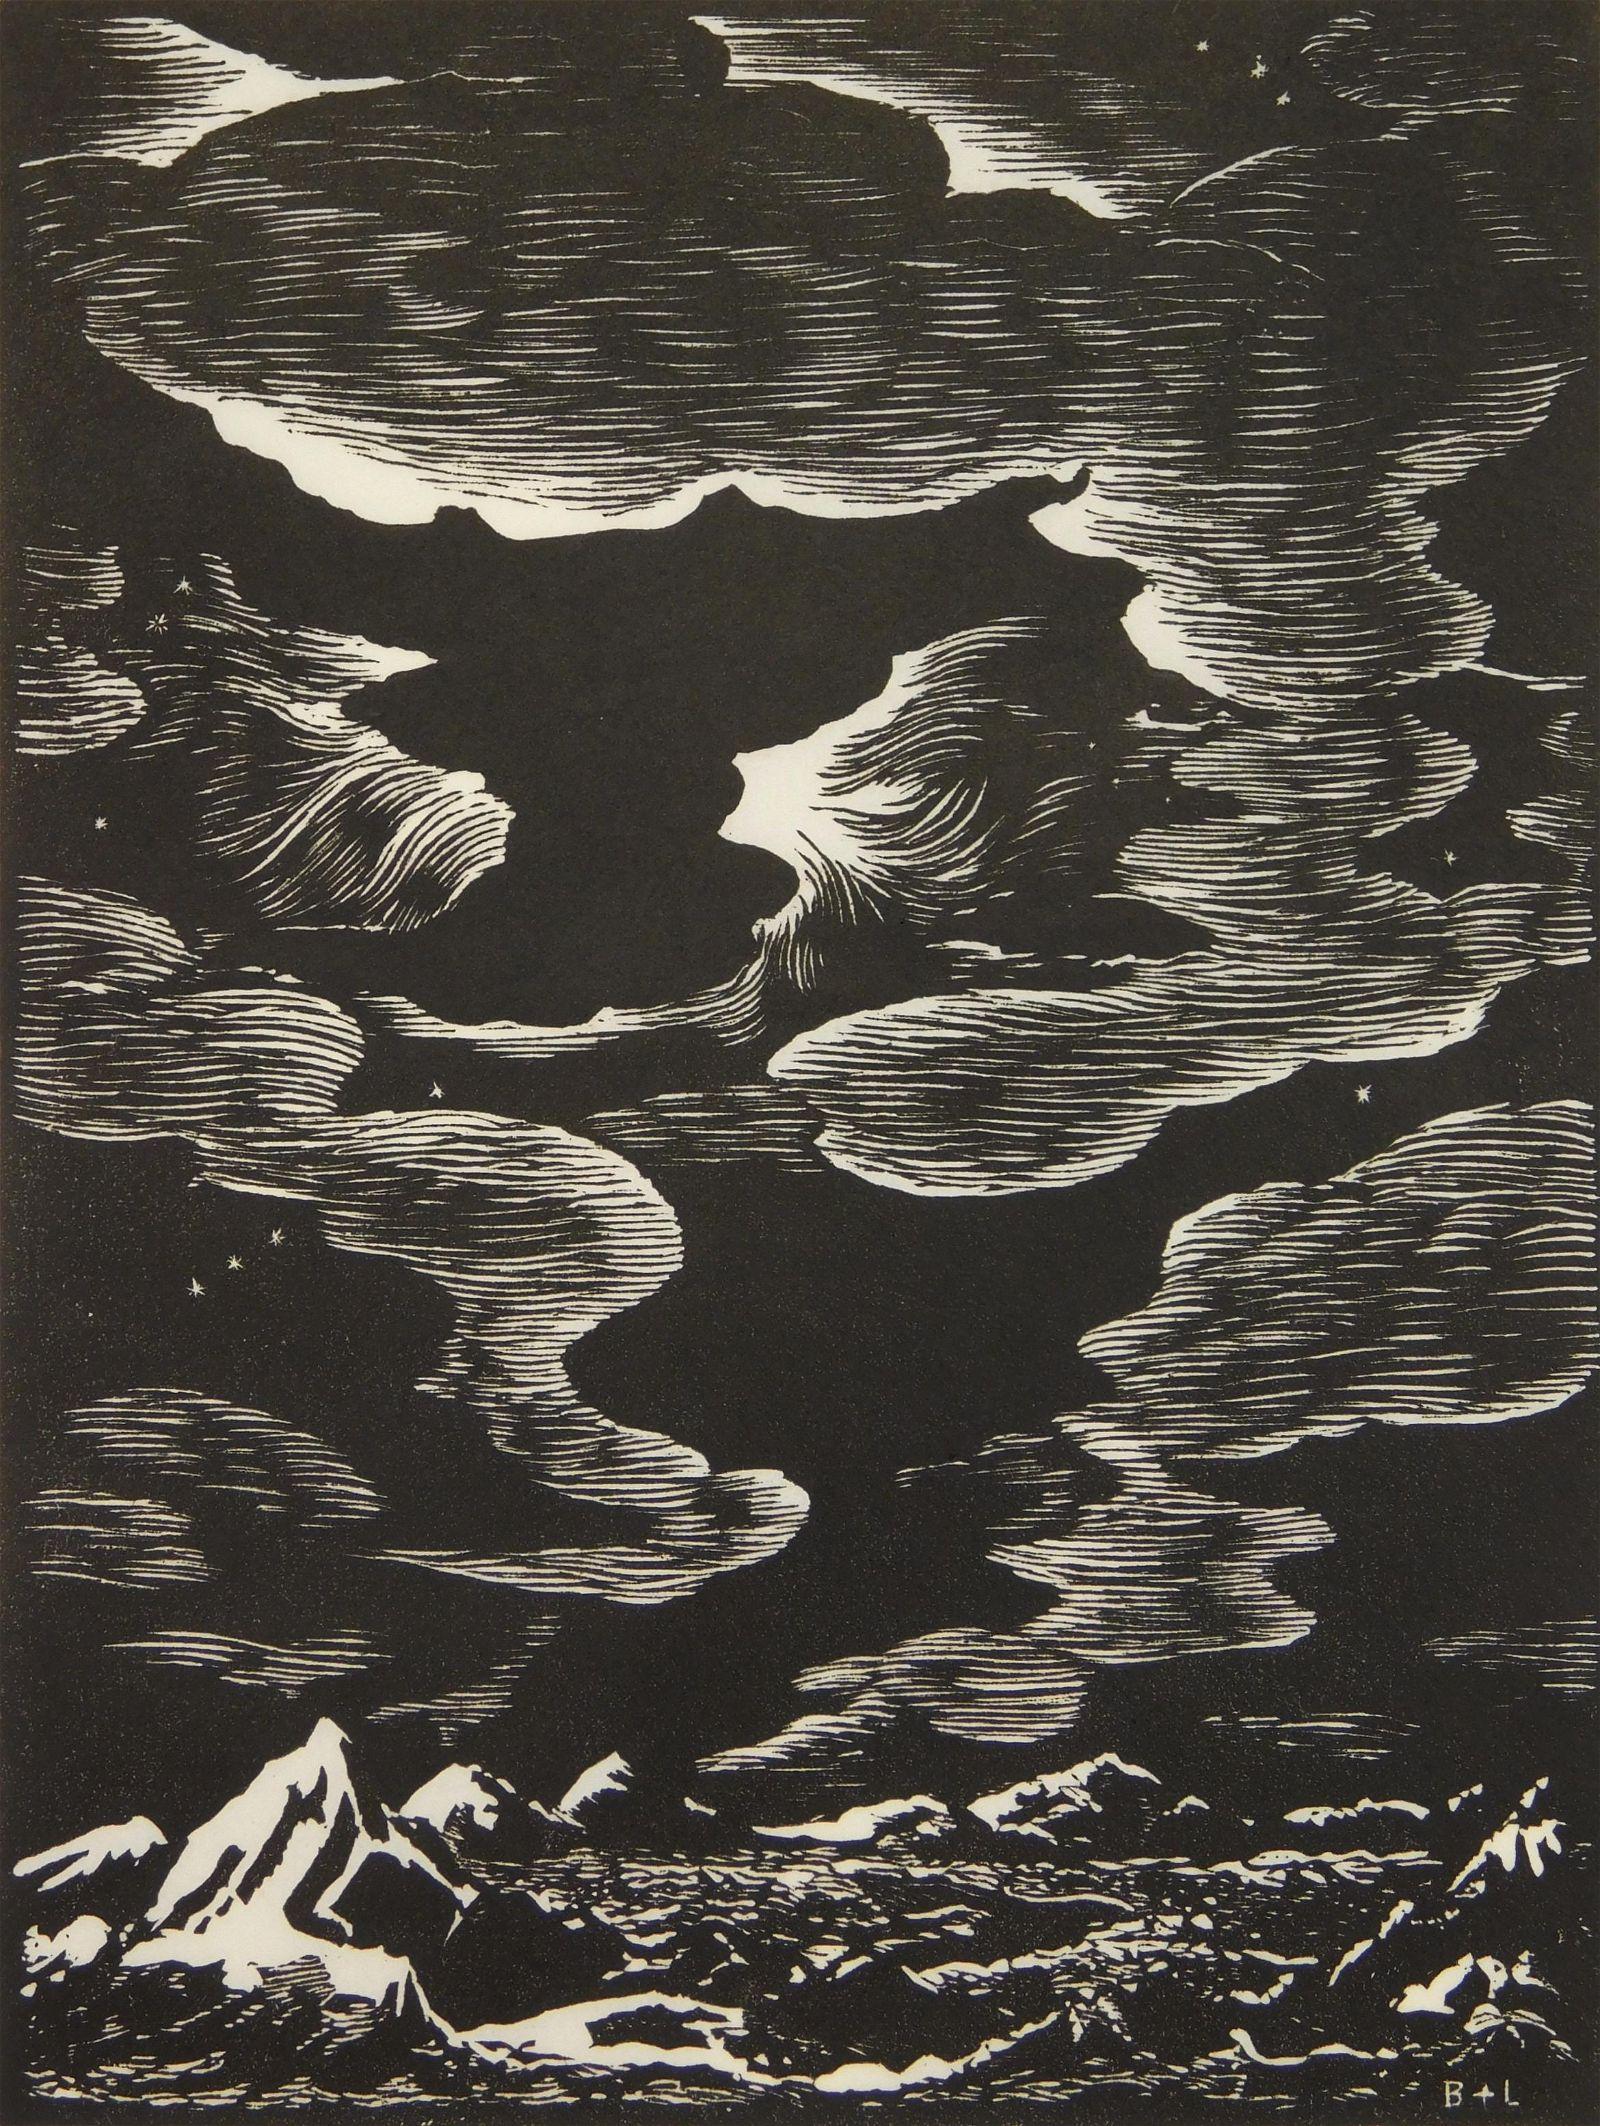 J. J. Lankes and C. Burchfield wood engraving